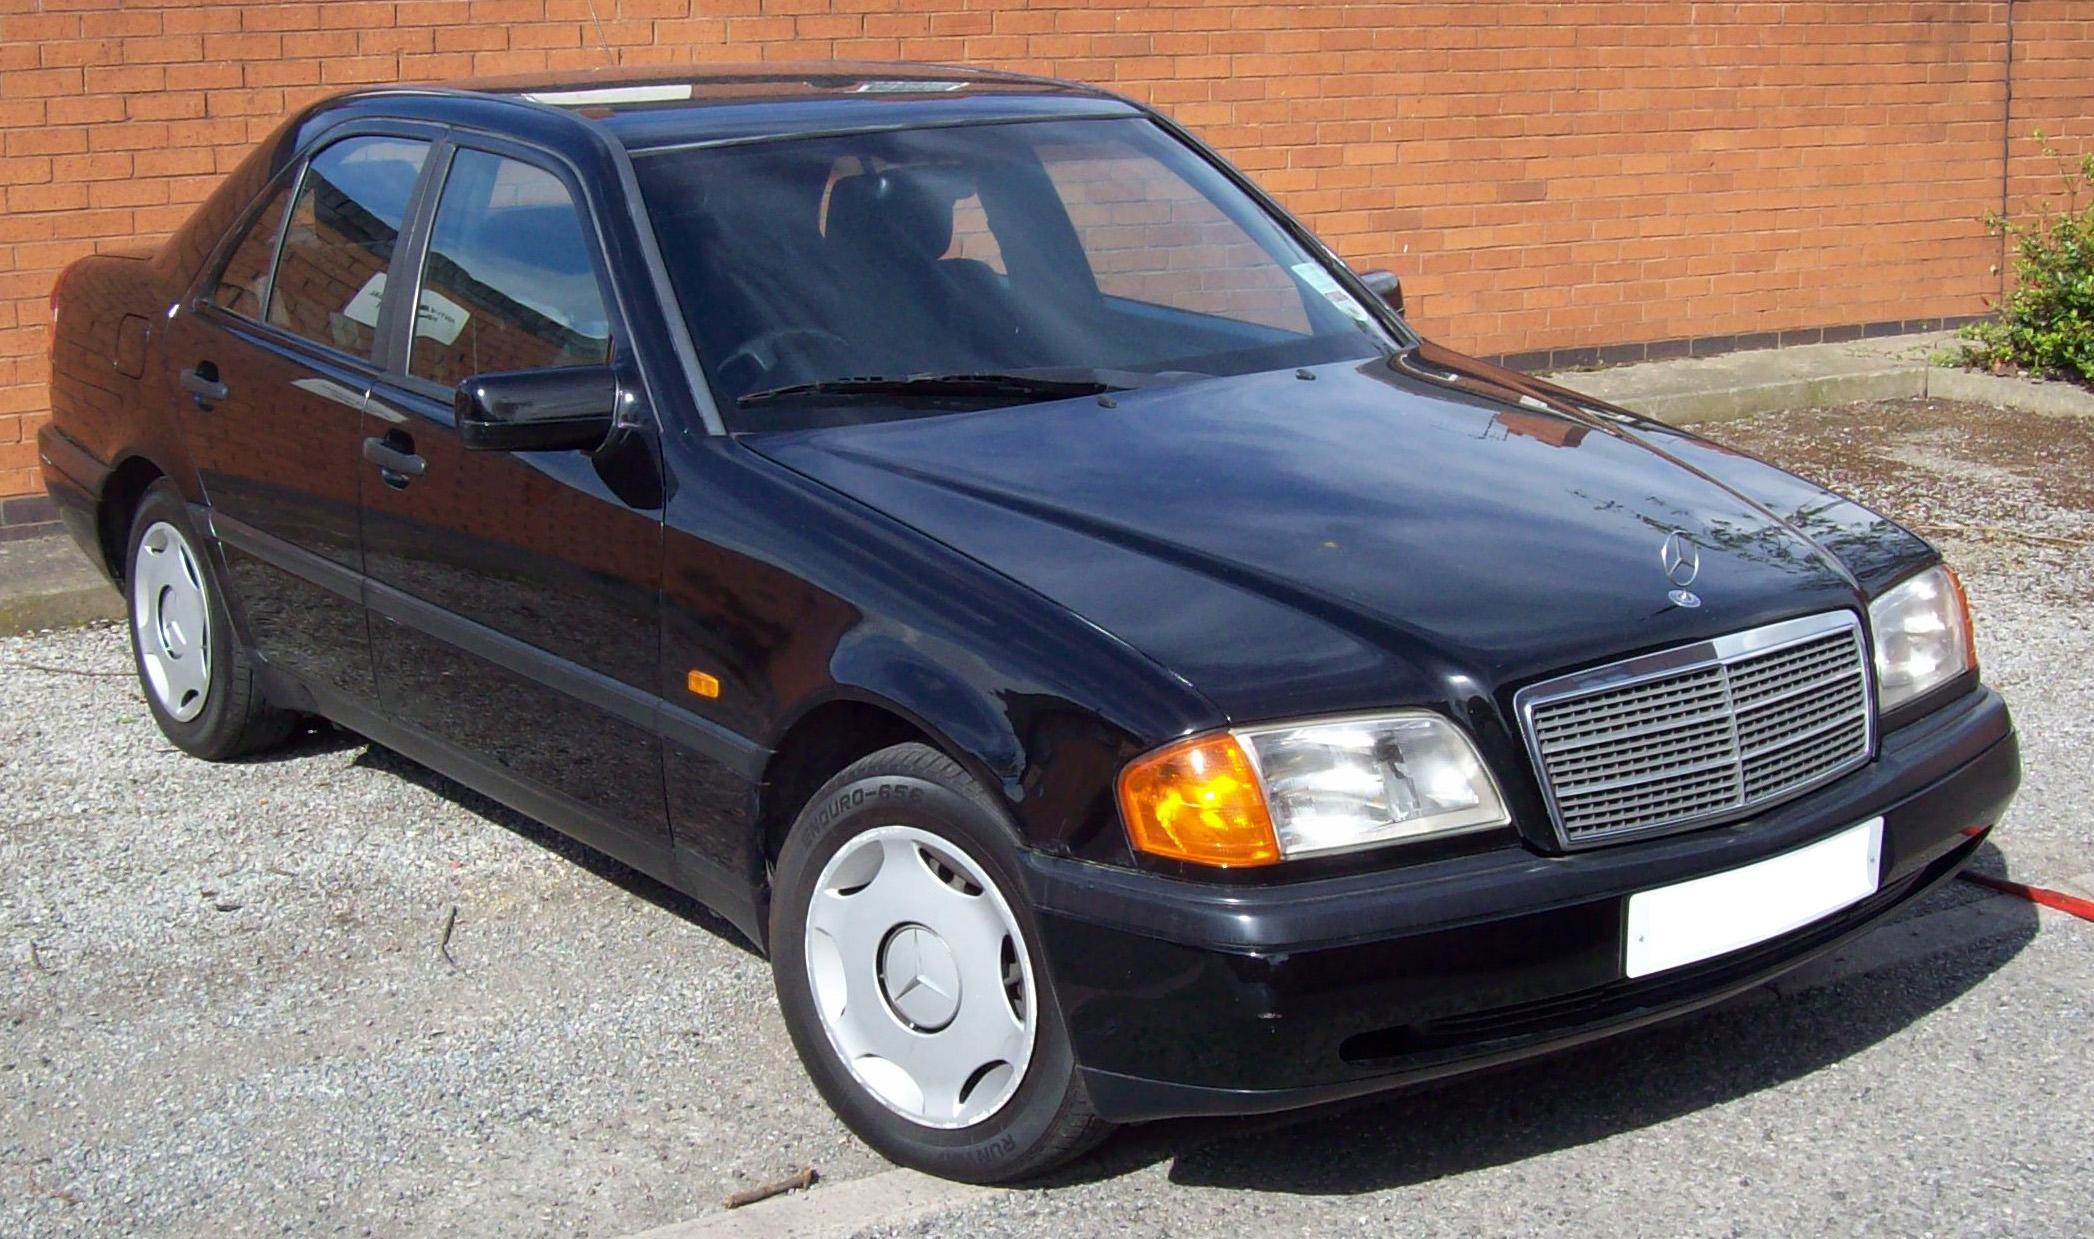 Datei:Mercedes-Benz W202 - C class.jpg – Wikipedia